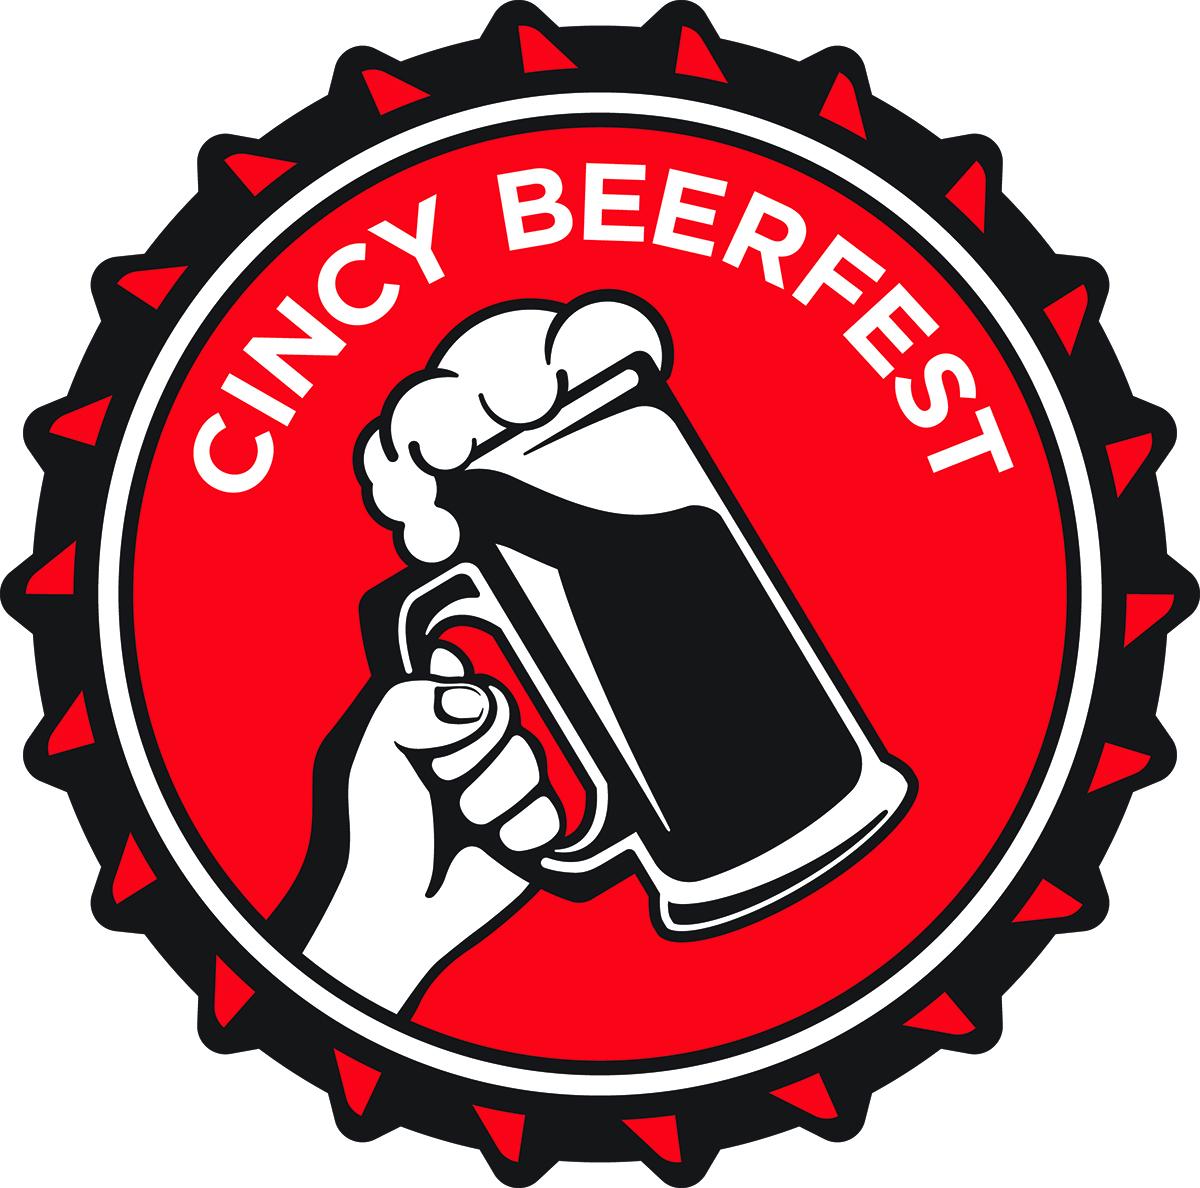 Cincy Beerfest